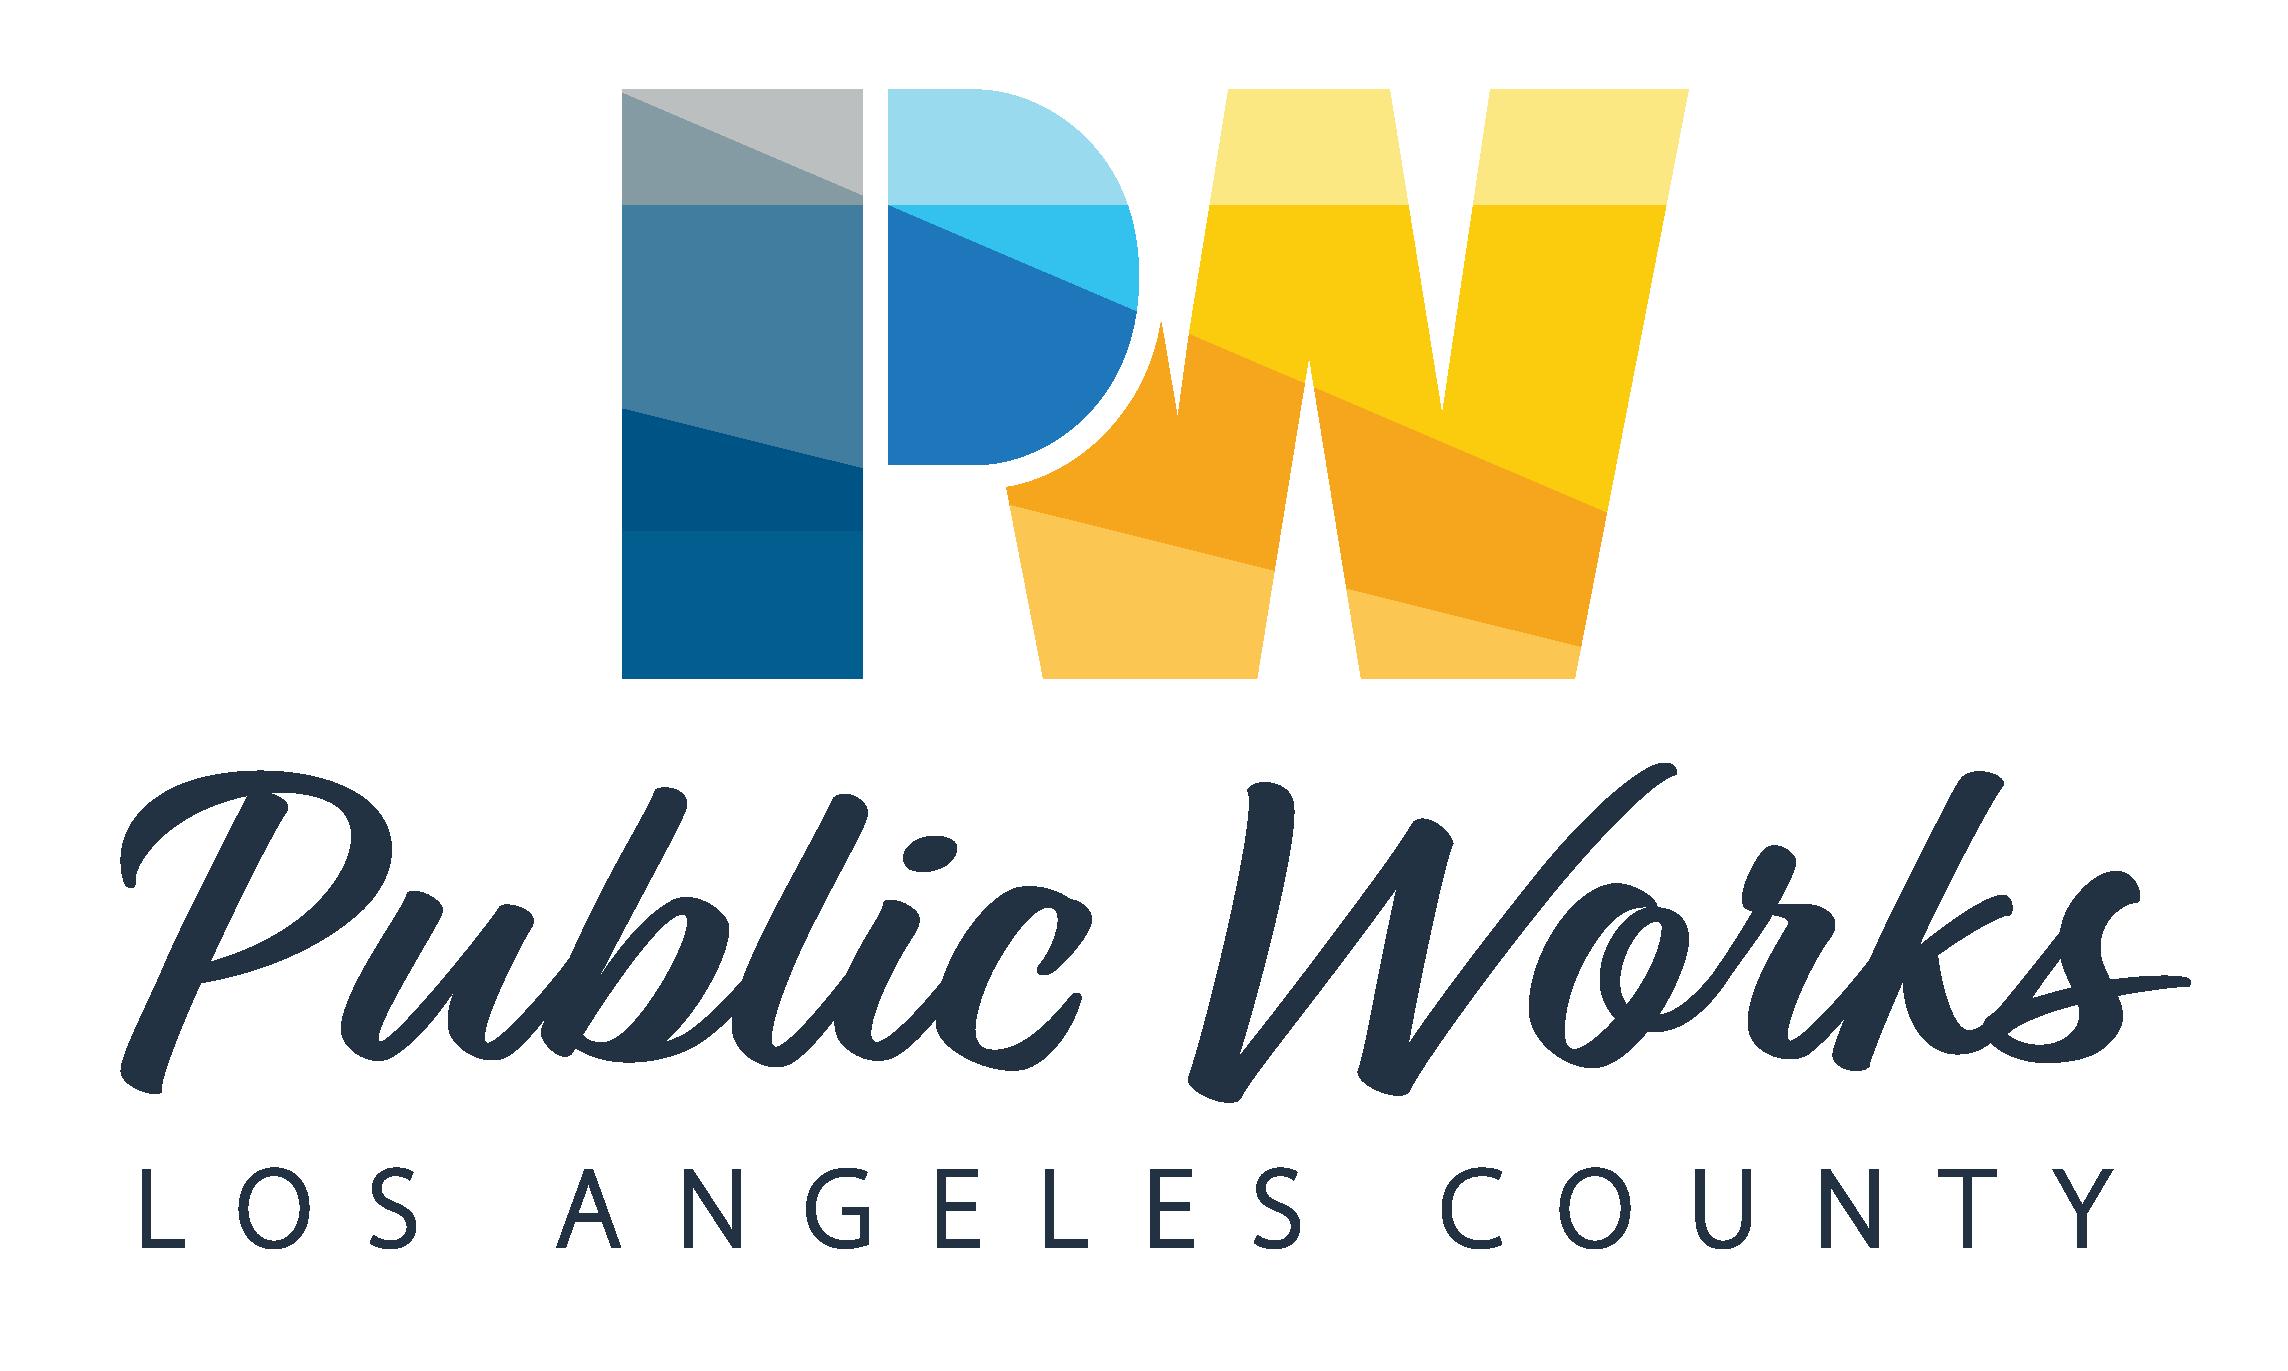 la county department of public works | verdexchange